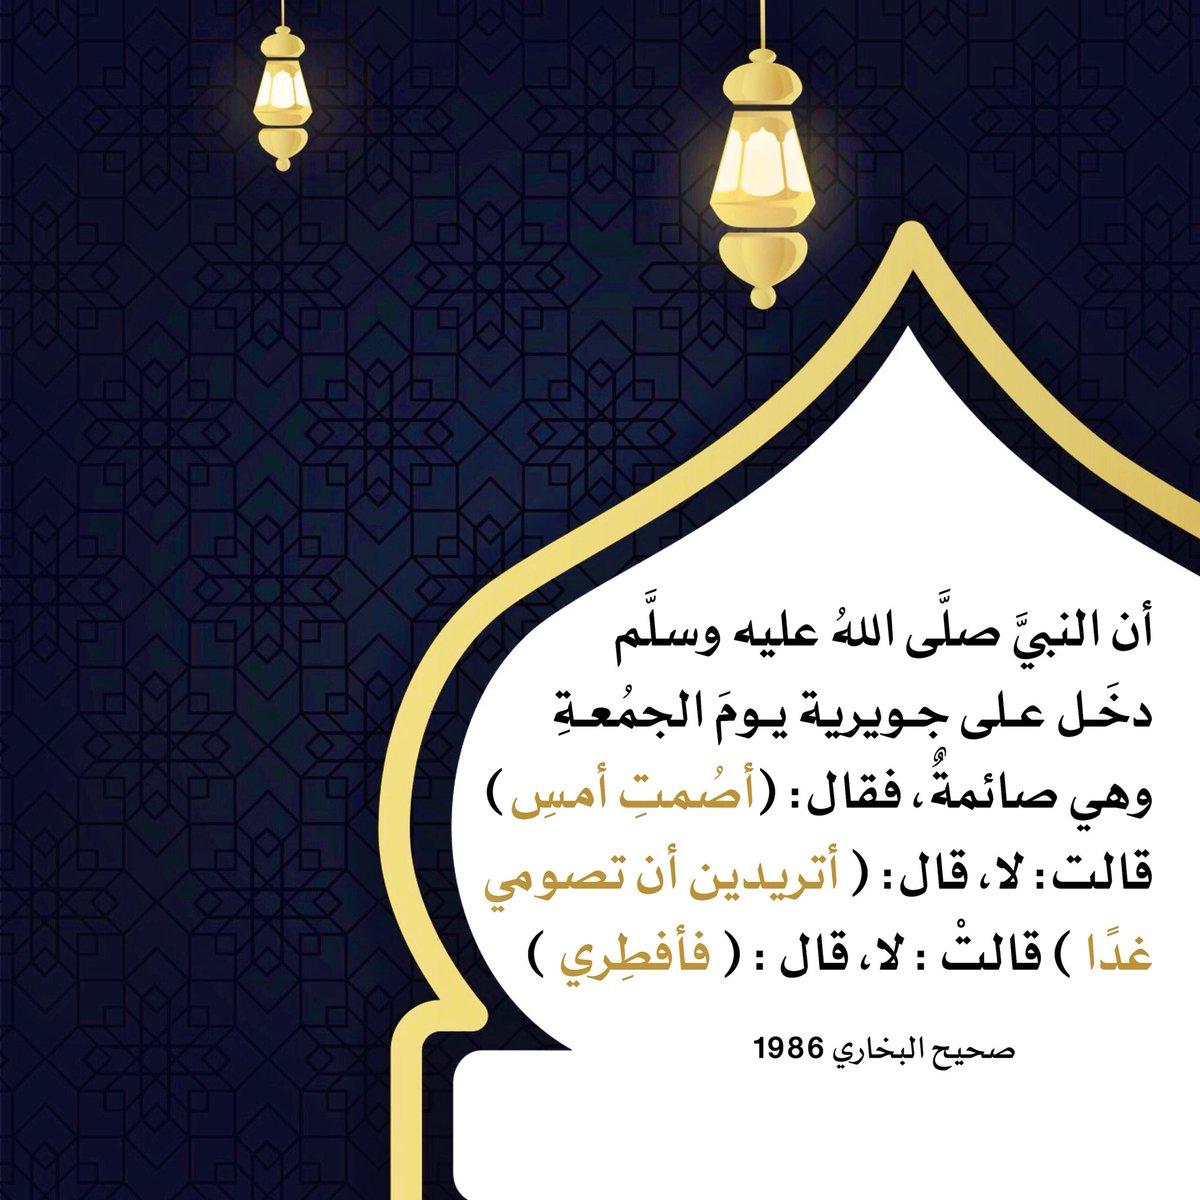 م د ه ام ت ان On Twitter حديث اليوم حكم صيام يوم